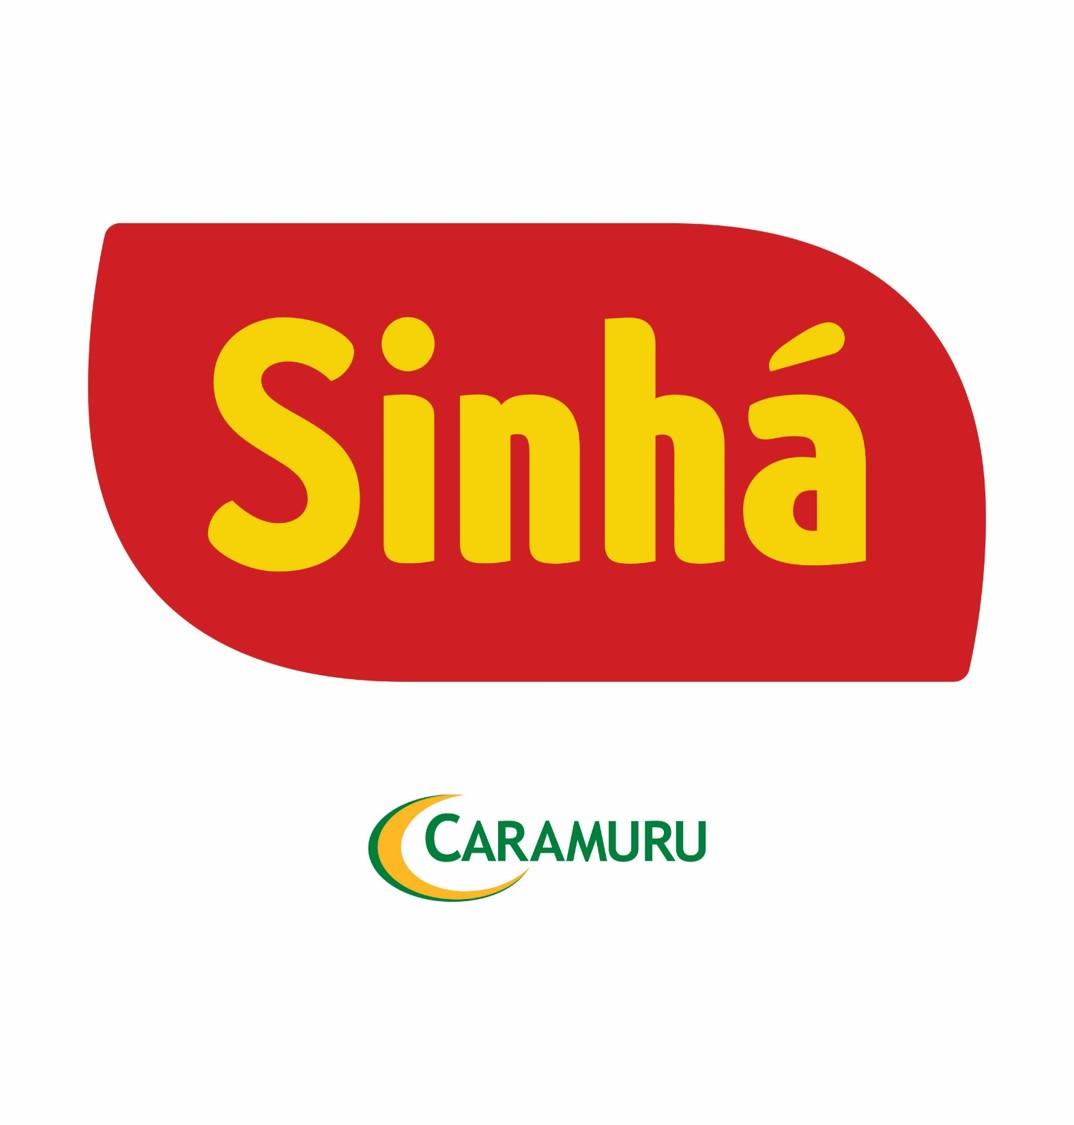 Logotipo Sinhá